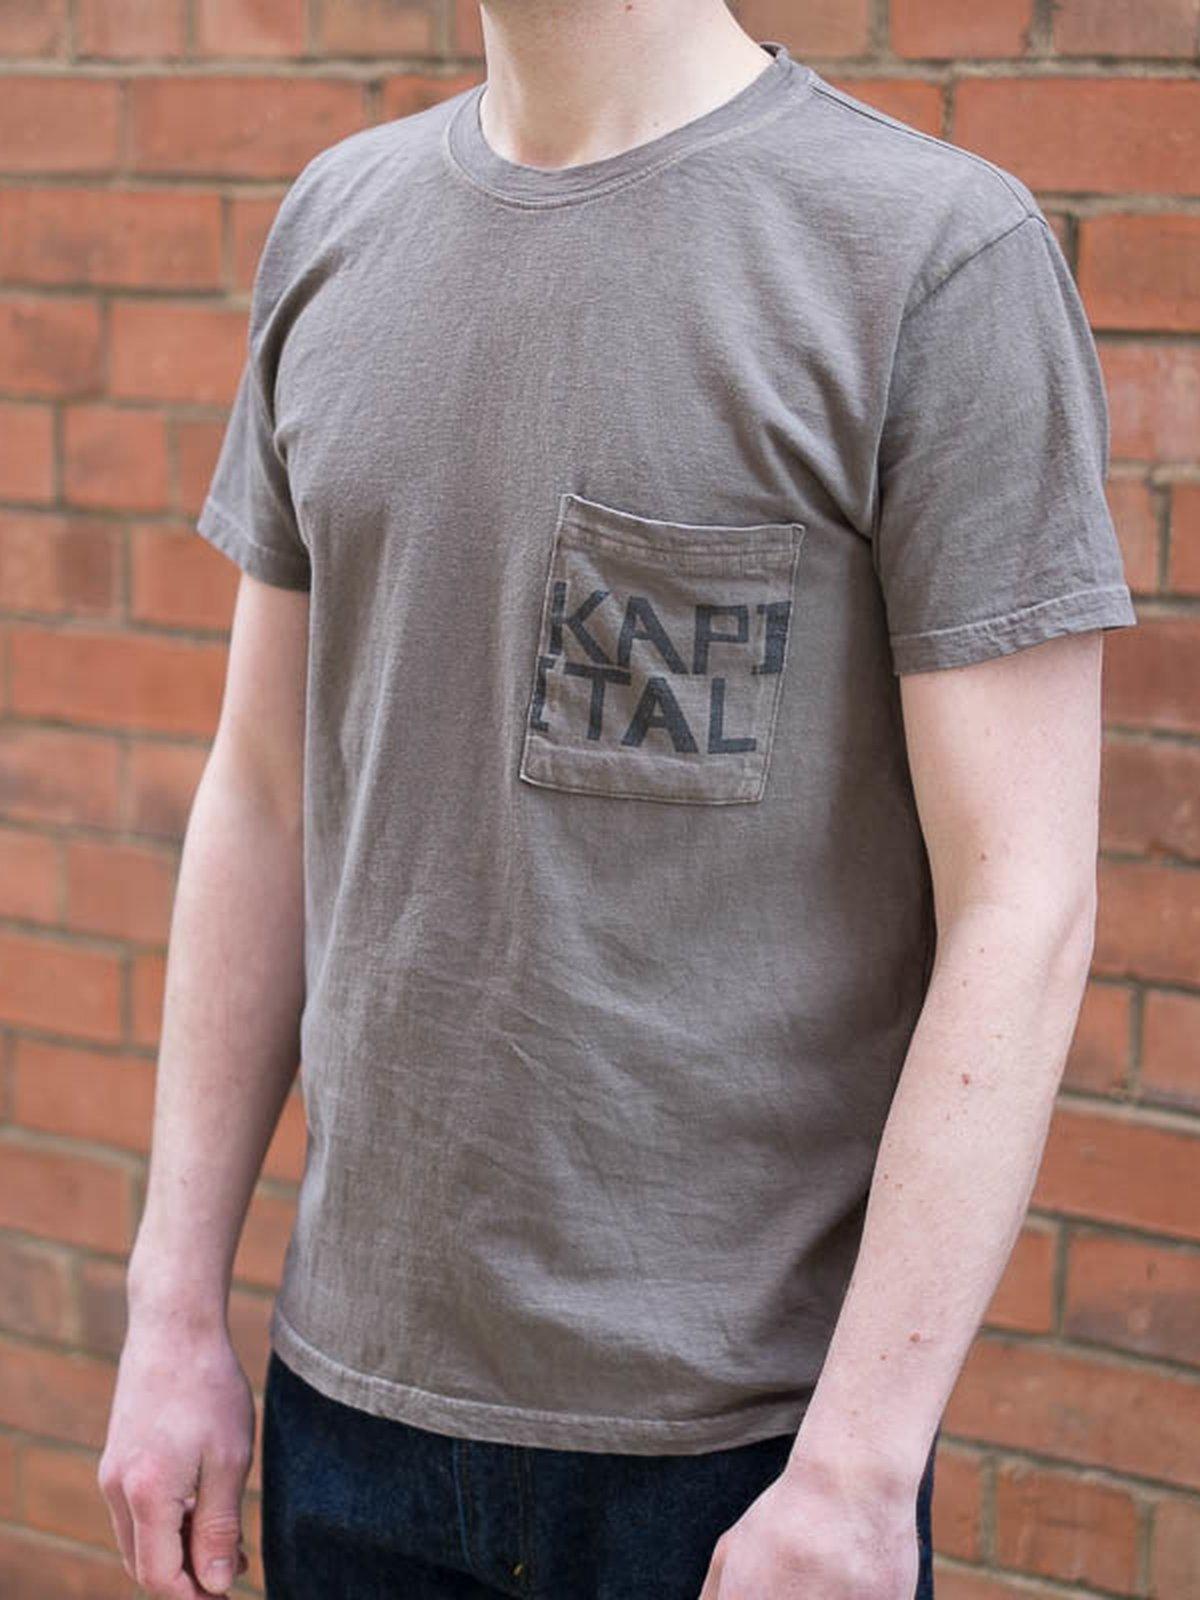 Charcoal Grey Kapital Jersey Crew Pocket T–Shirt - Image 5